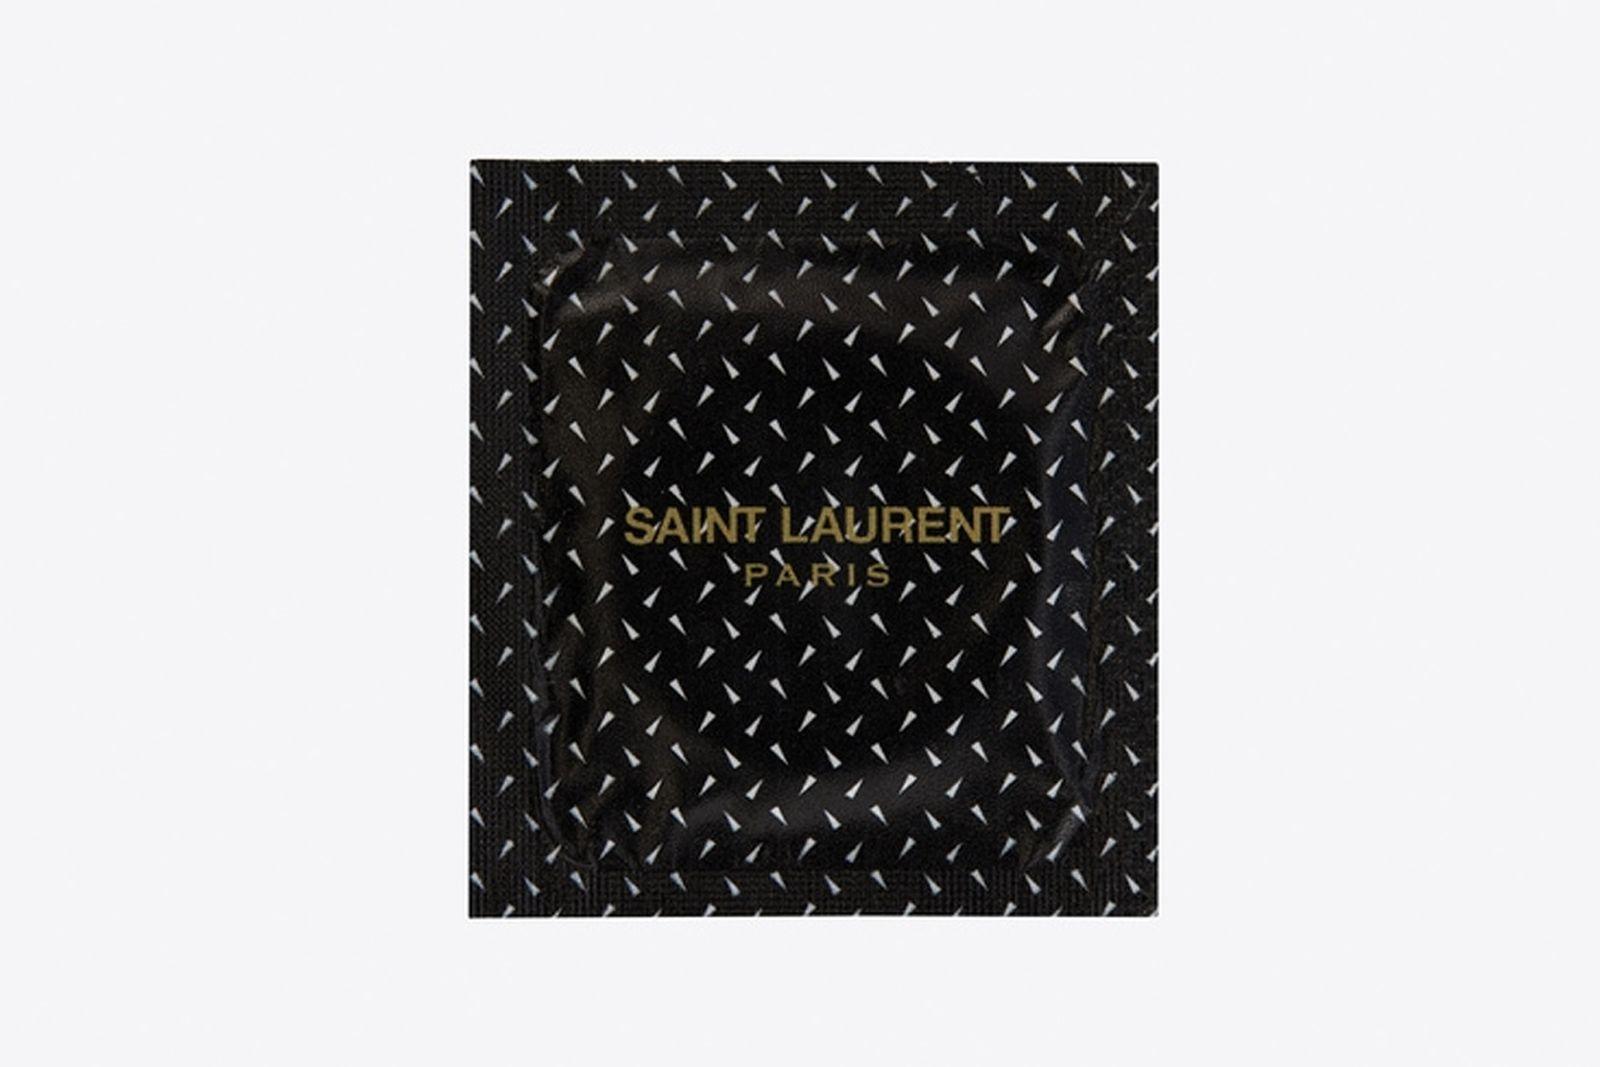 saint laurent condoms the love affair juergen teller